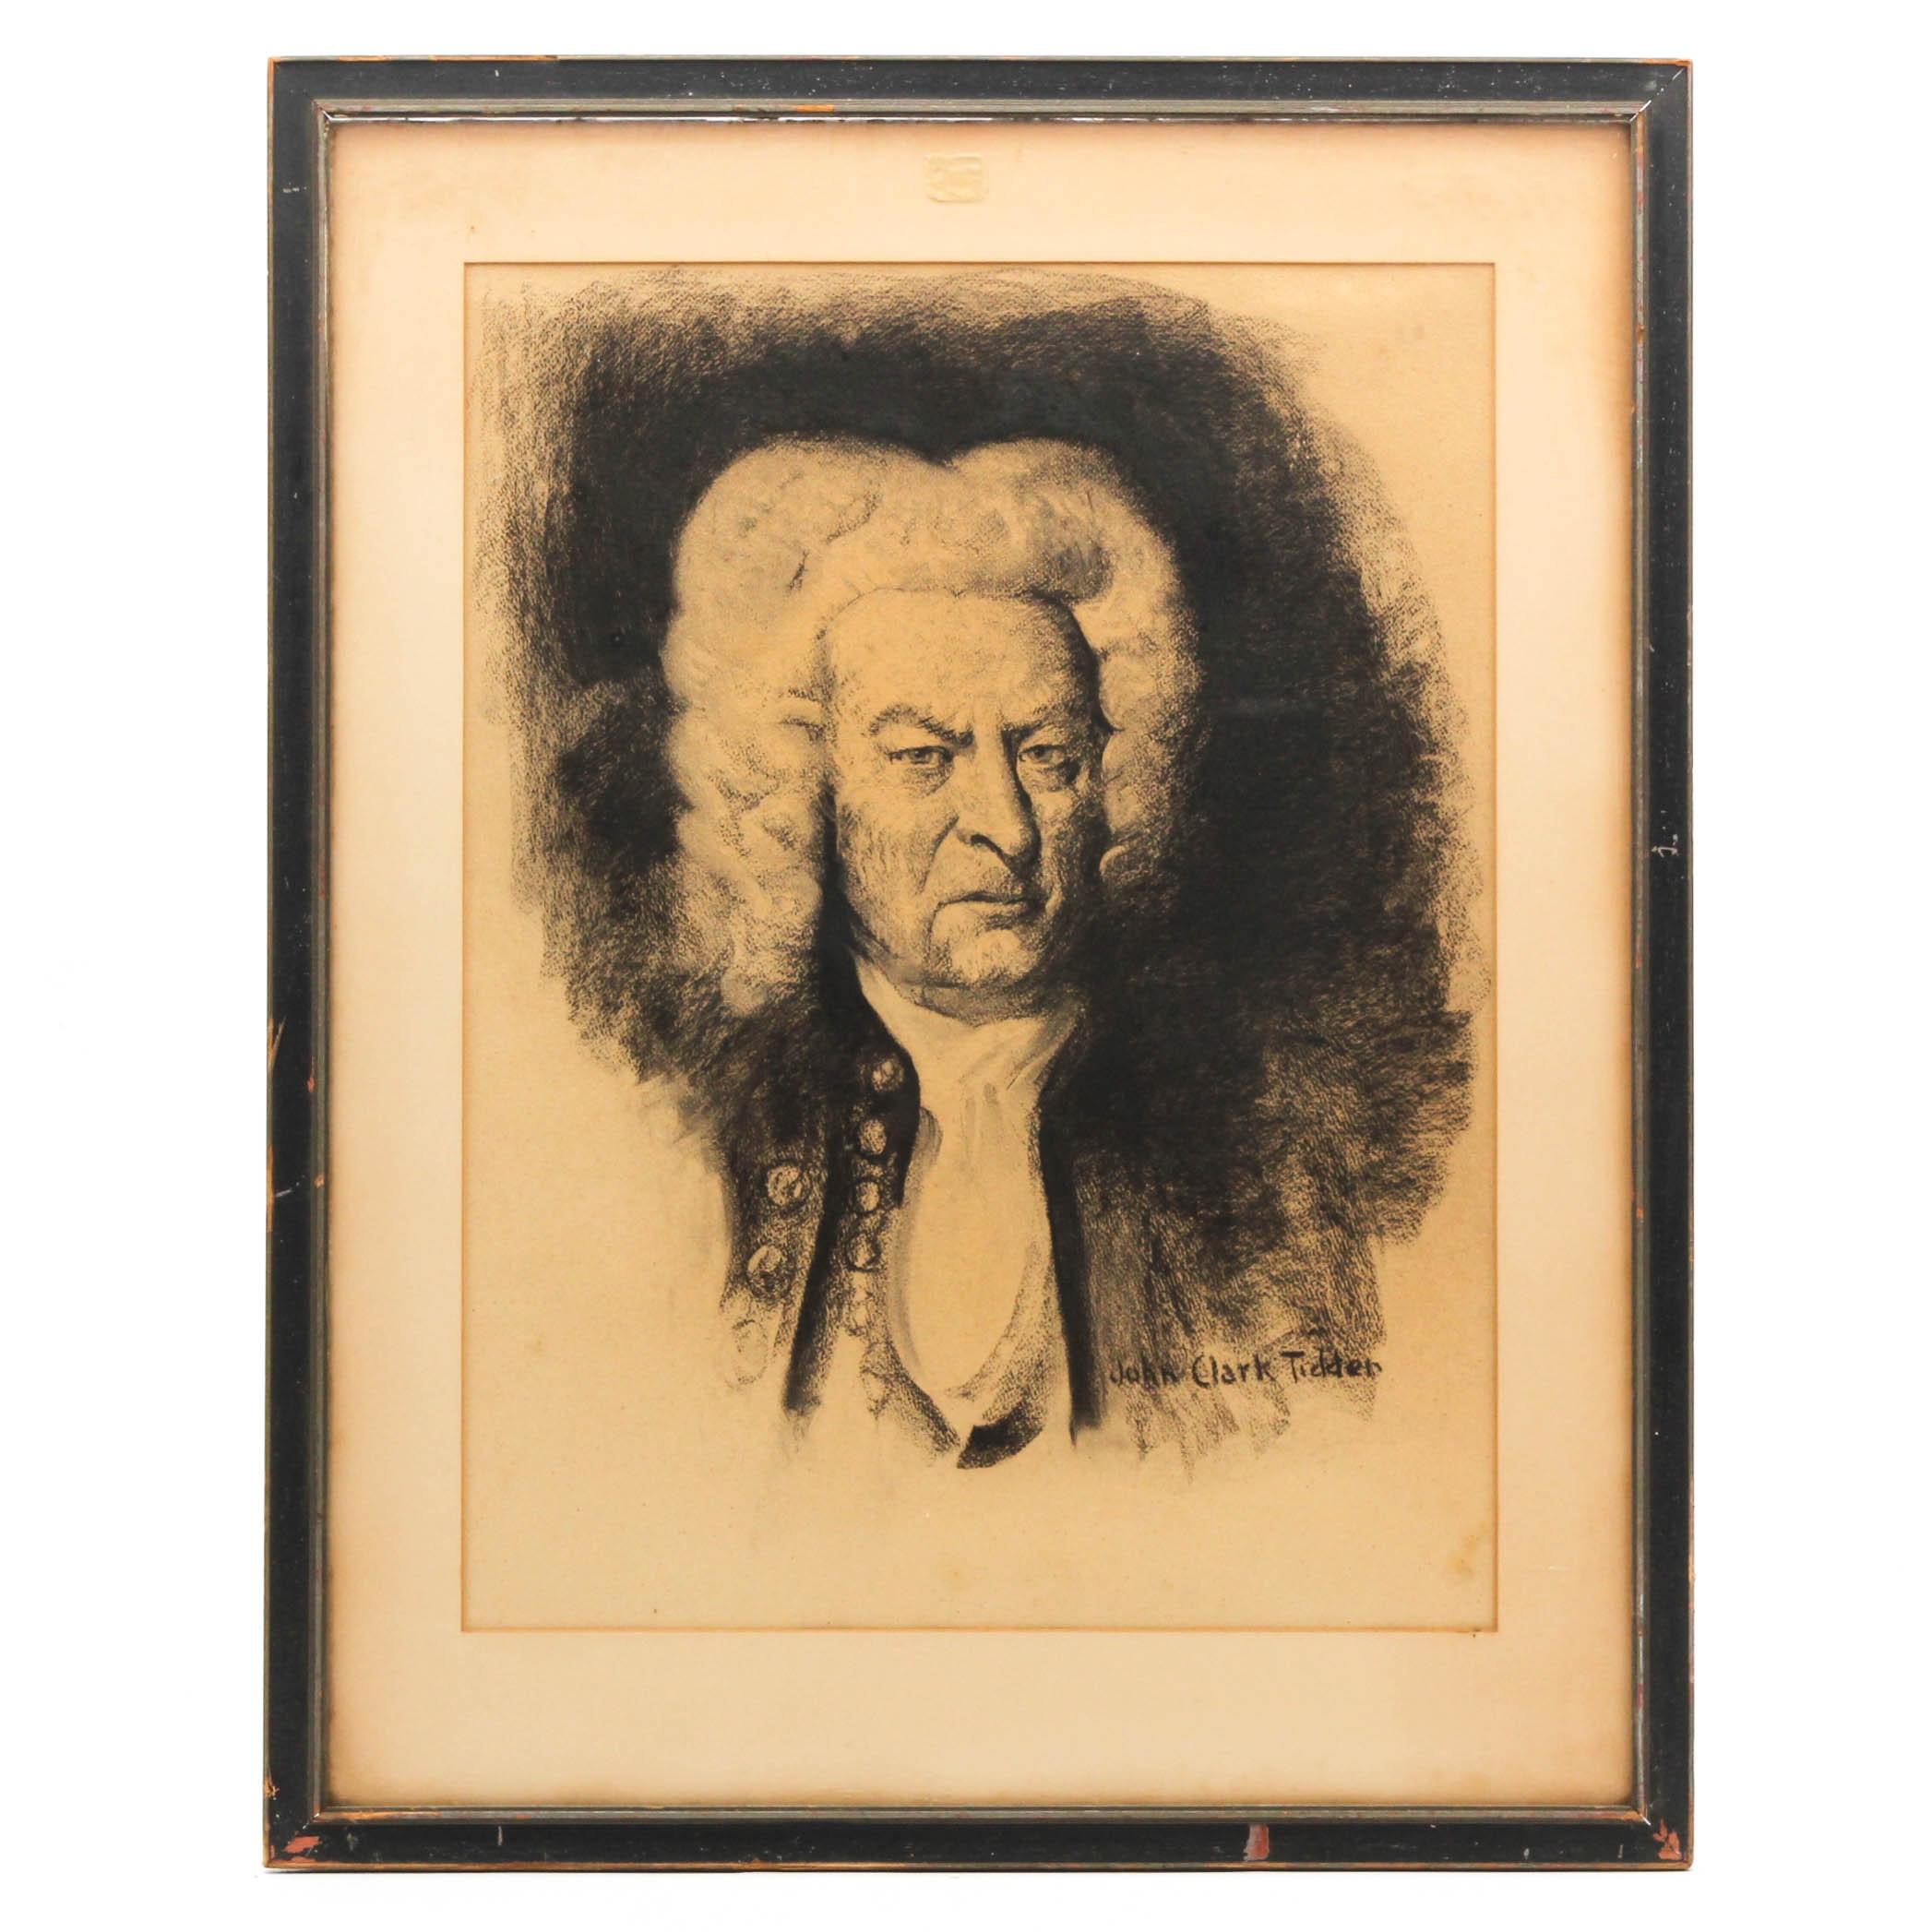 John Clark Tidder Charcoal Portrait Depicting Johann Sebastian Bach